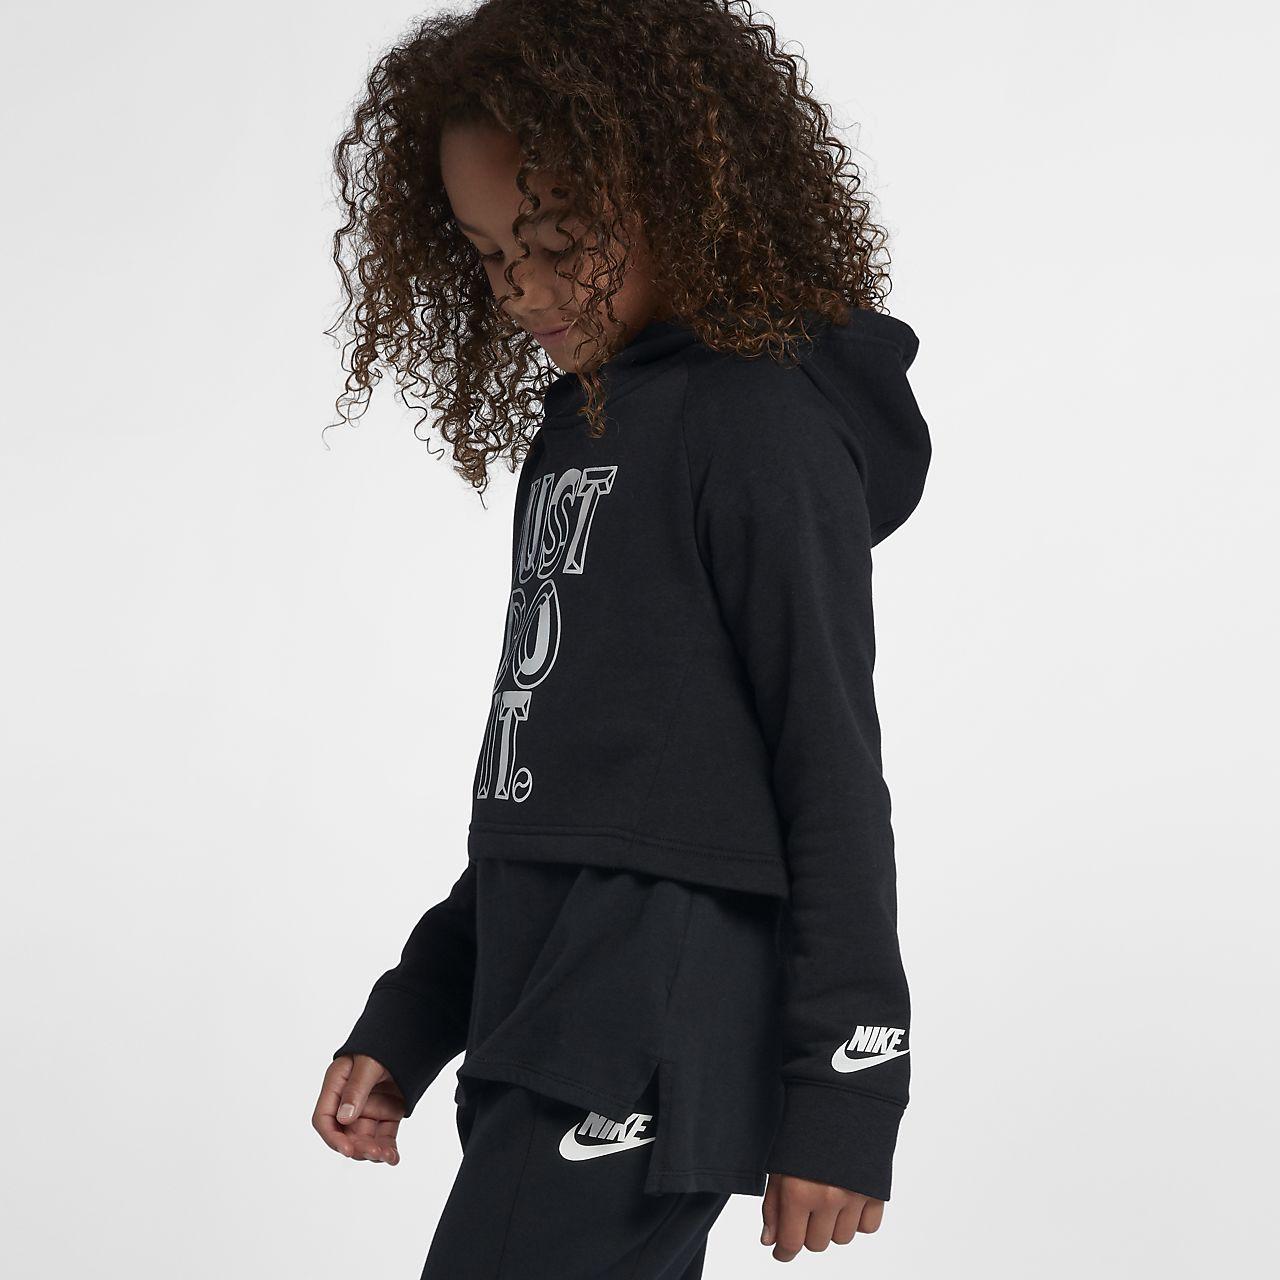 4a09db5dc1 Nike Sportswear Big Kids' (Girls') JDI Cropped Hoodie. Nike.com